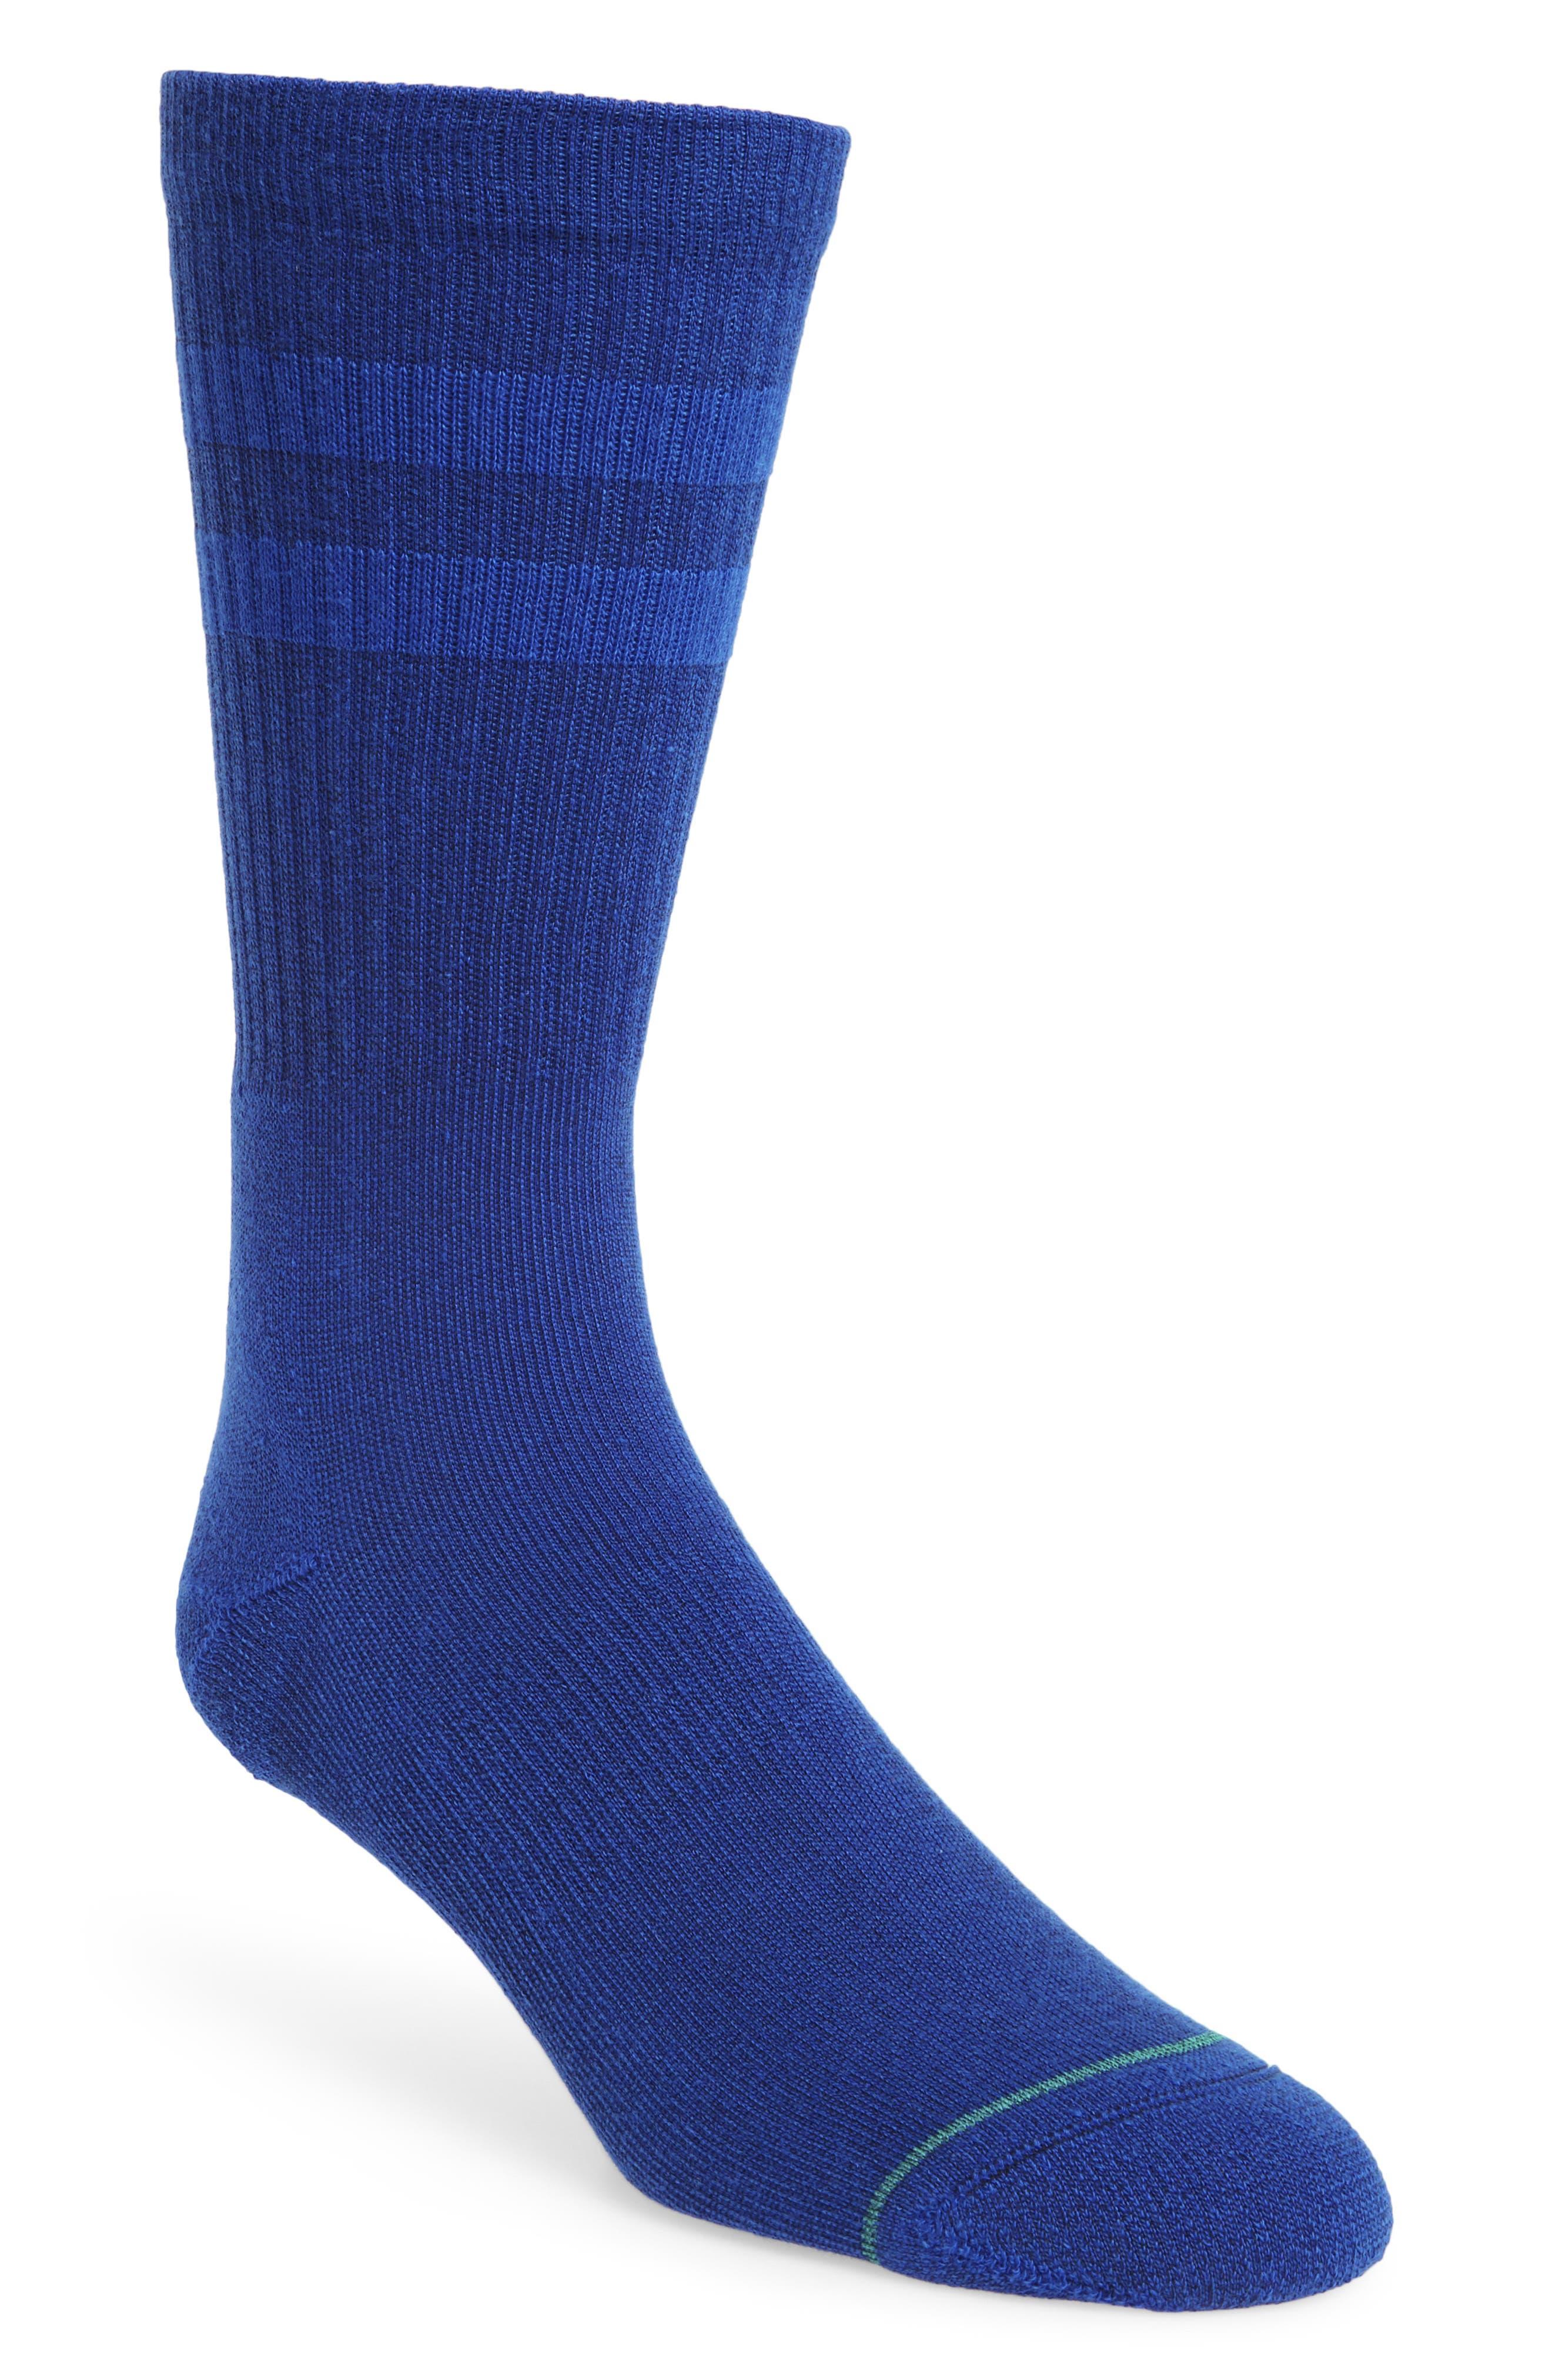 Alternate Image 1 Selected - Stance Joven Classic Crew Socks